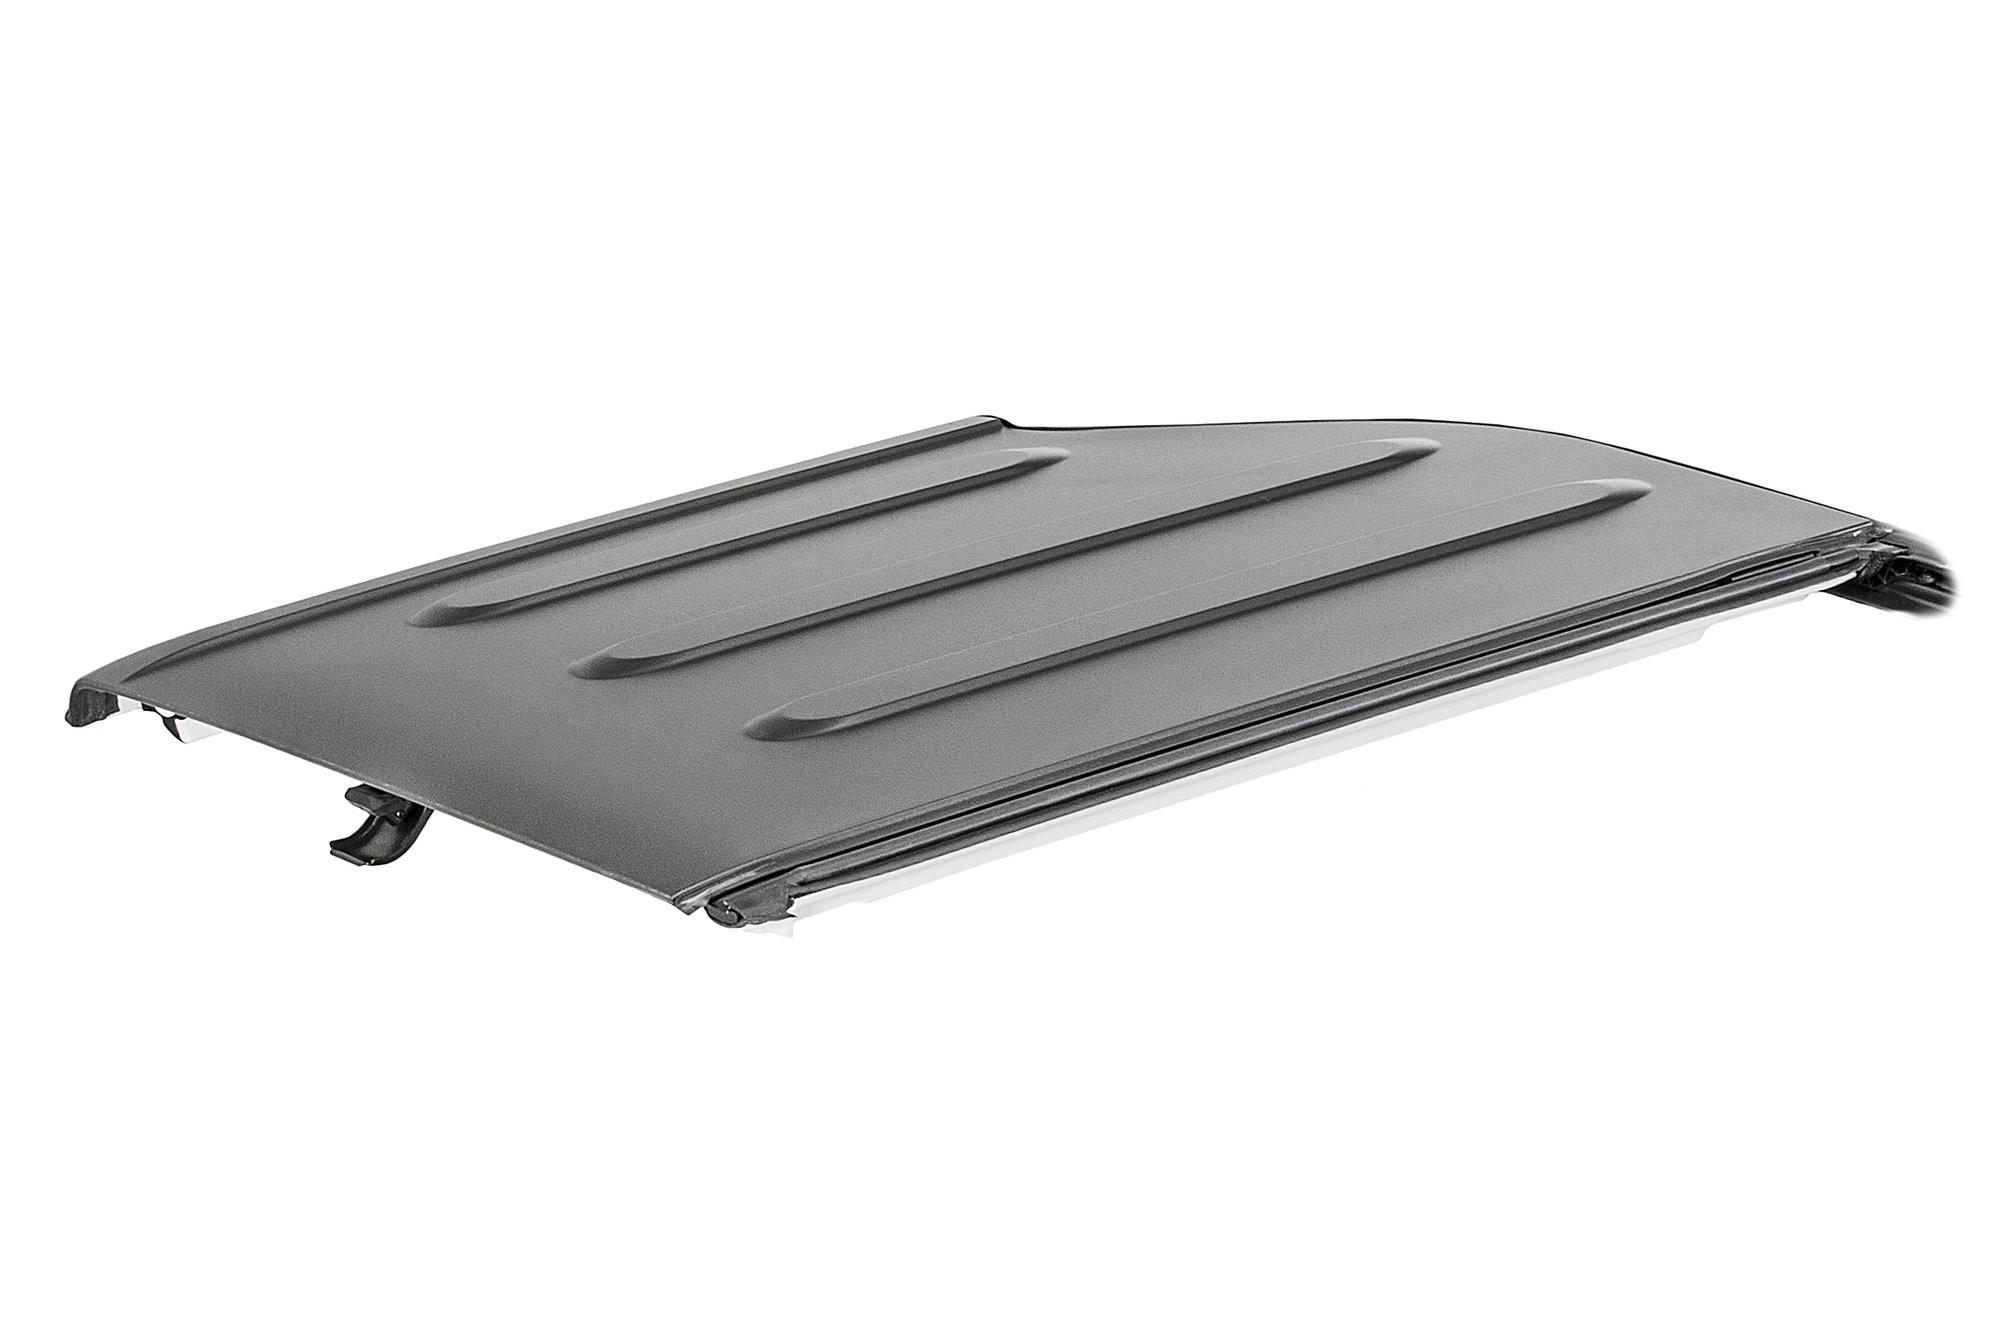 MOPAR Freedom Top Panel Right Side For 2011-18 Jeep Wrangler JK 2 Door & Unlimited 4 Door Models 1PH98RXFAG